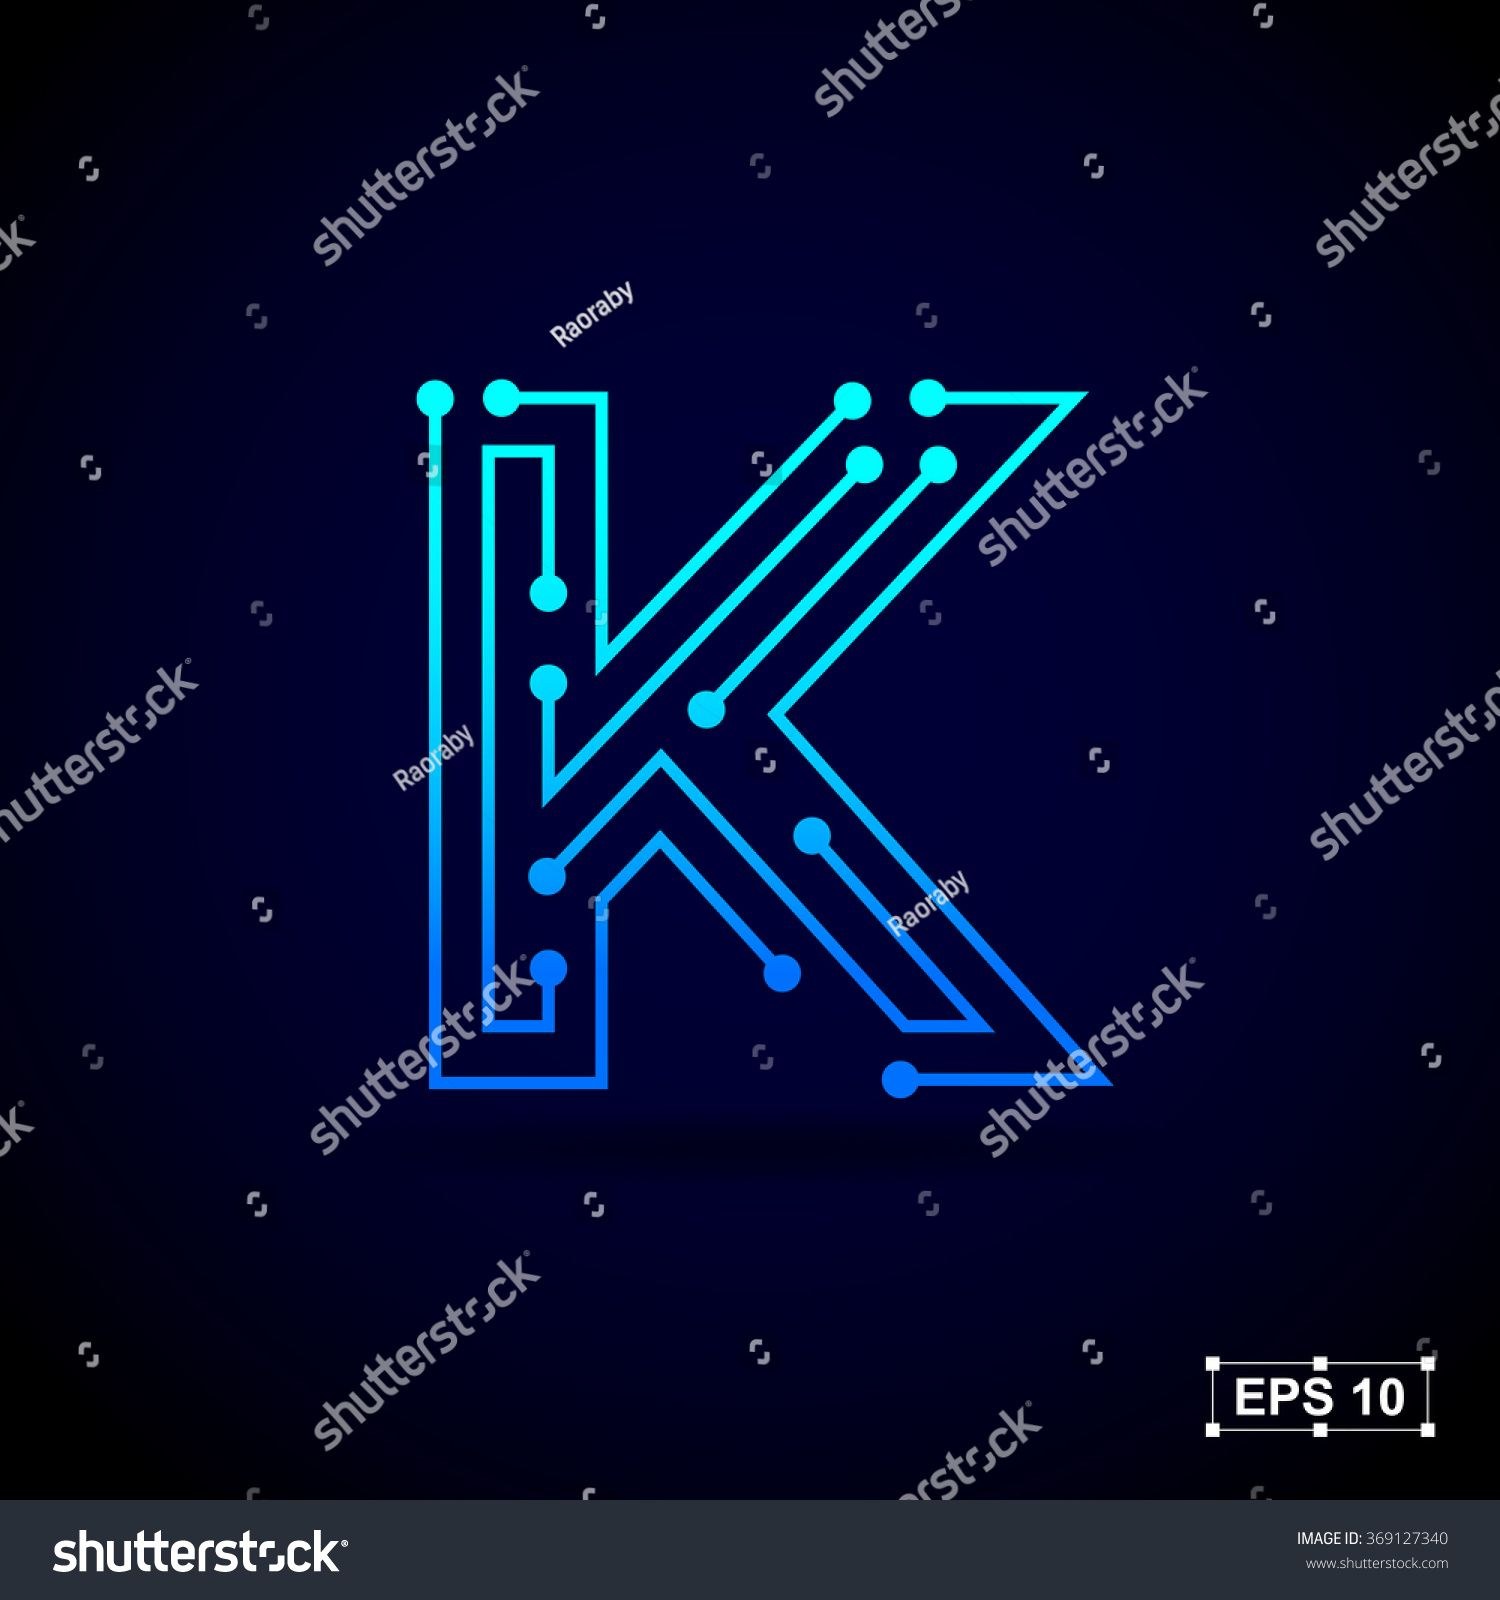 Letter K logo design template,Technology abstract dot